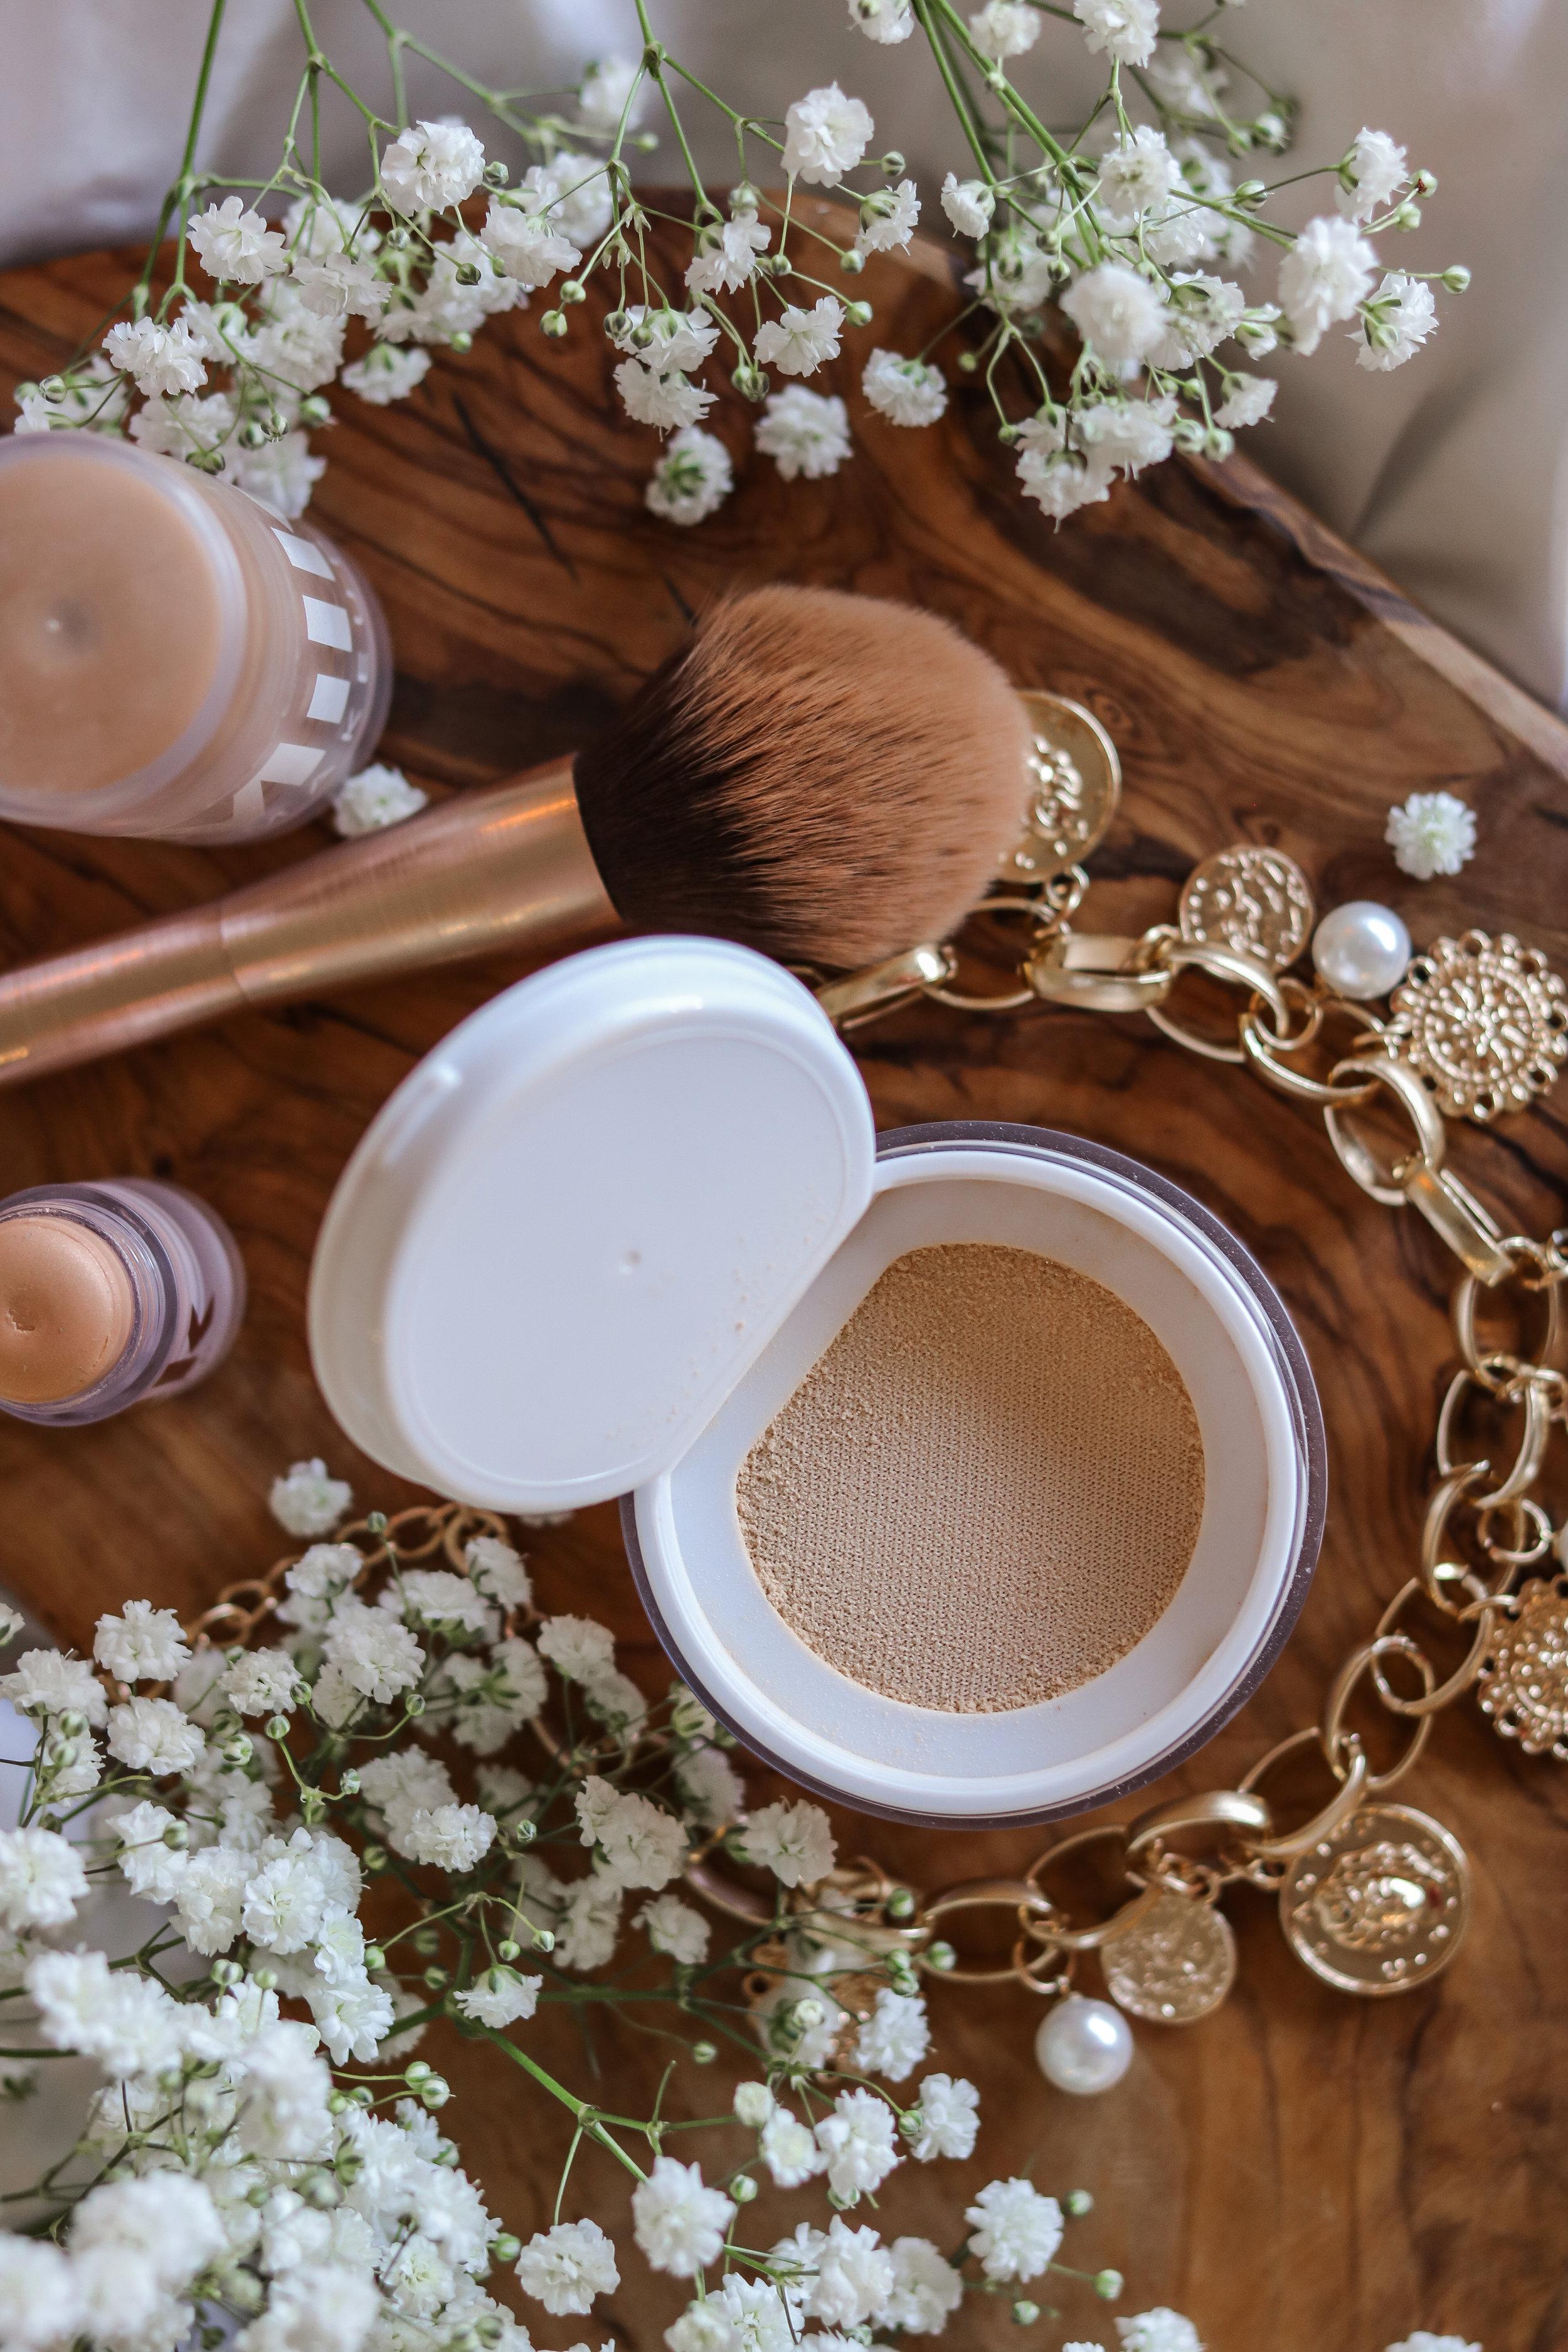 The Hungarian Brunette Milk Makeup blur + Set loose setting powder review